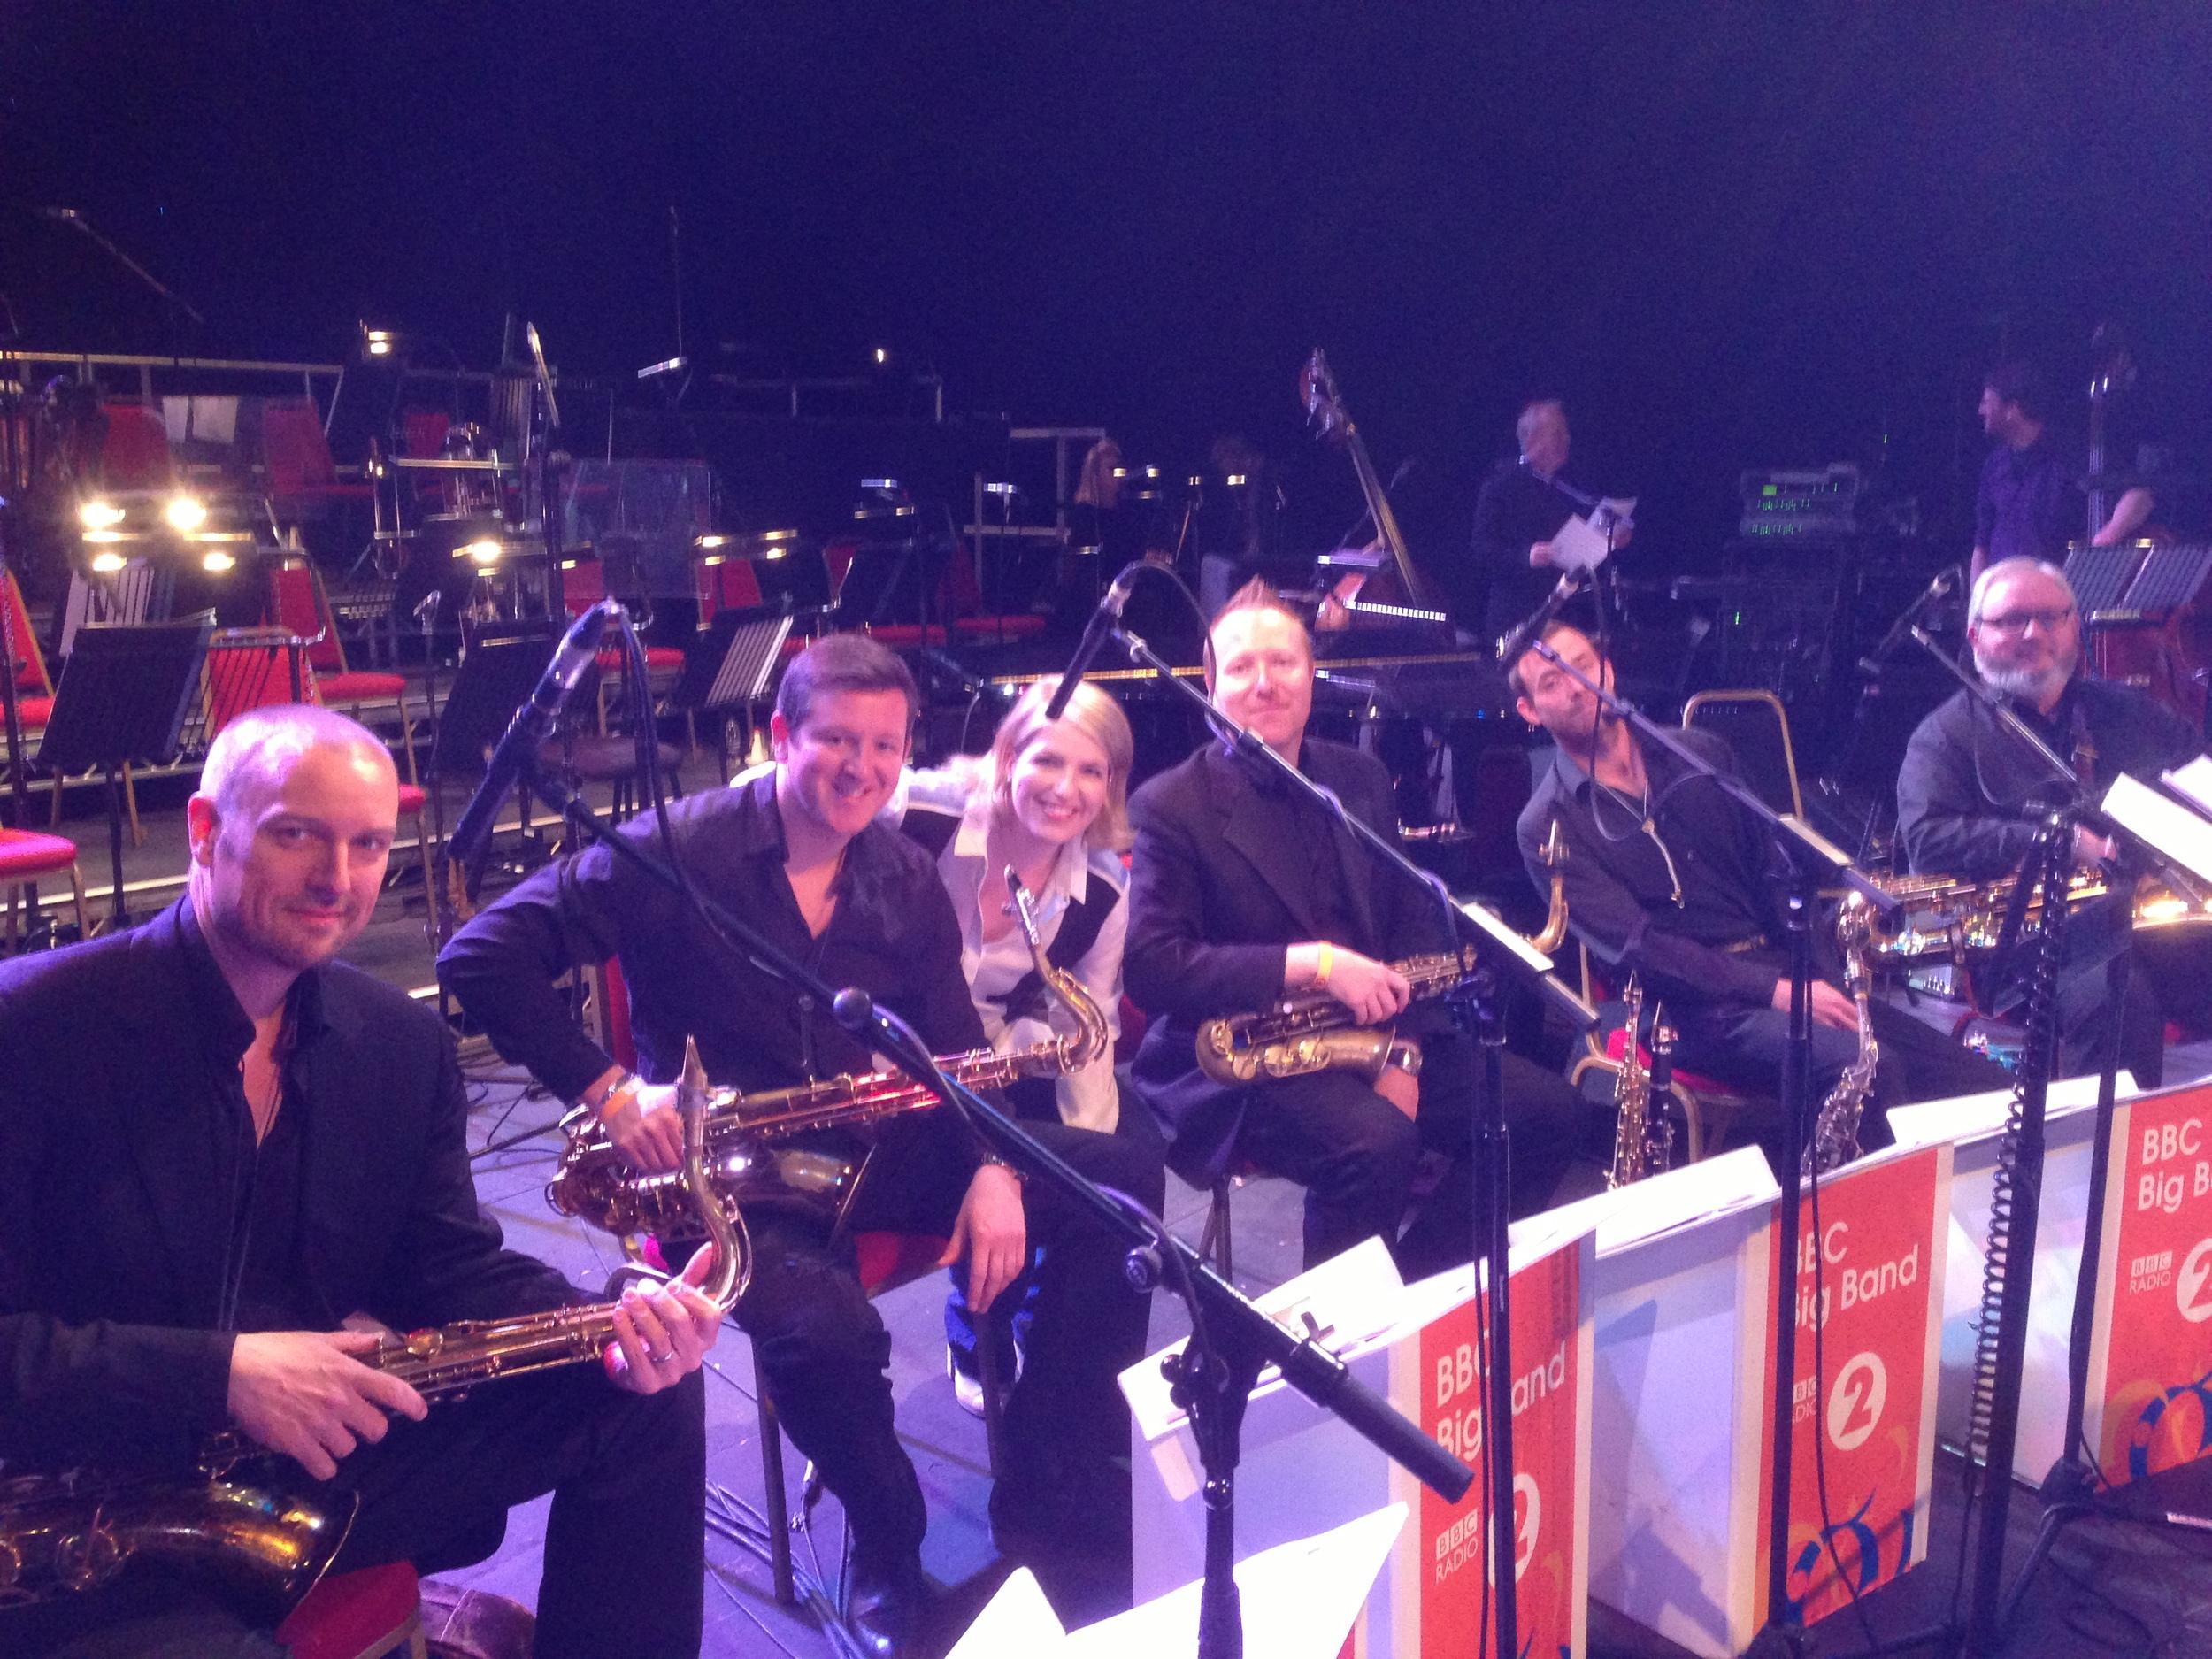 BBC Big Band sax section, 2013. MW, Paul Booth, Clare Teal, Howard McGill, Sammy Mayne, Jay Craig